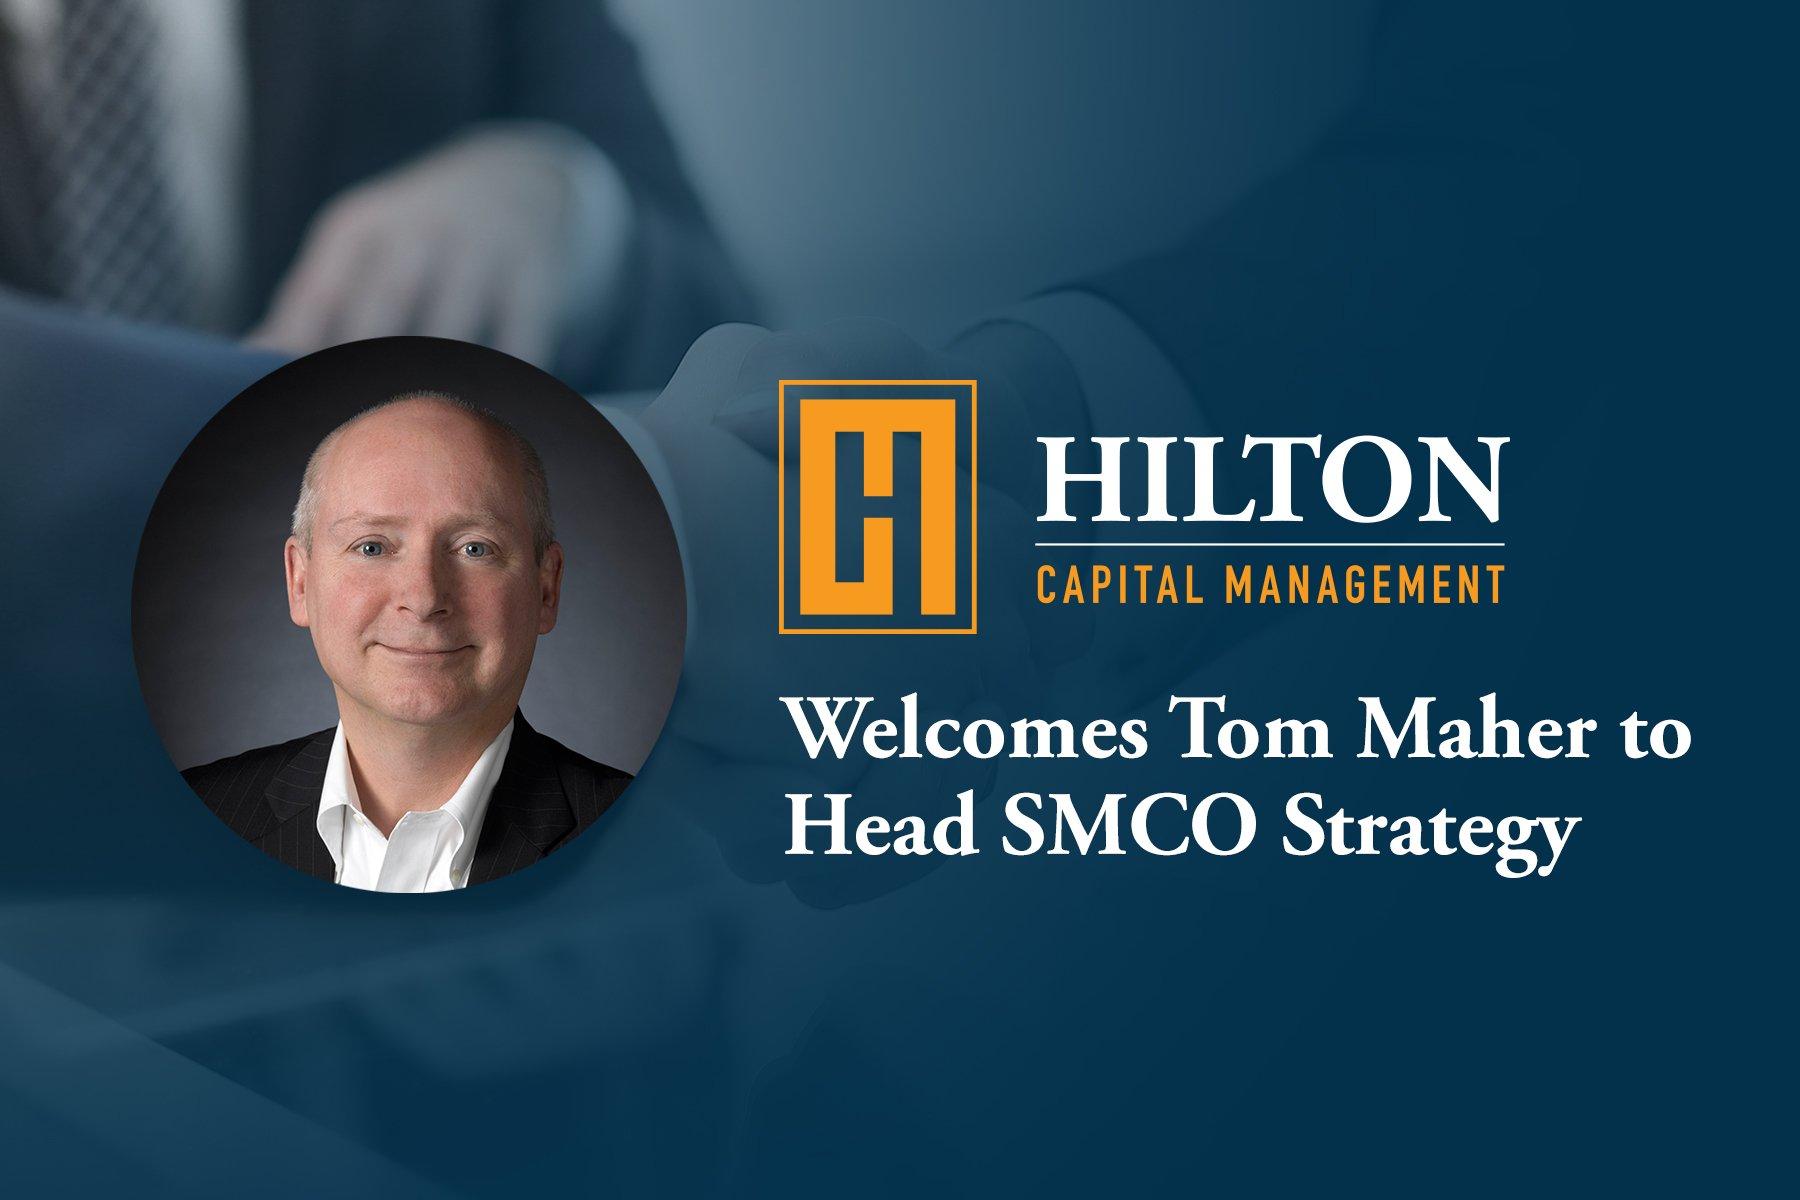 HiltonCapitalManagement-Blog-Hilton-Capital-Welcomes-Tom-Maher-to-Head-SMCO-Strategy